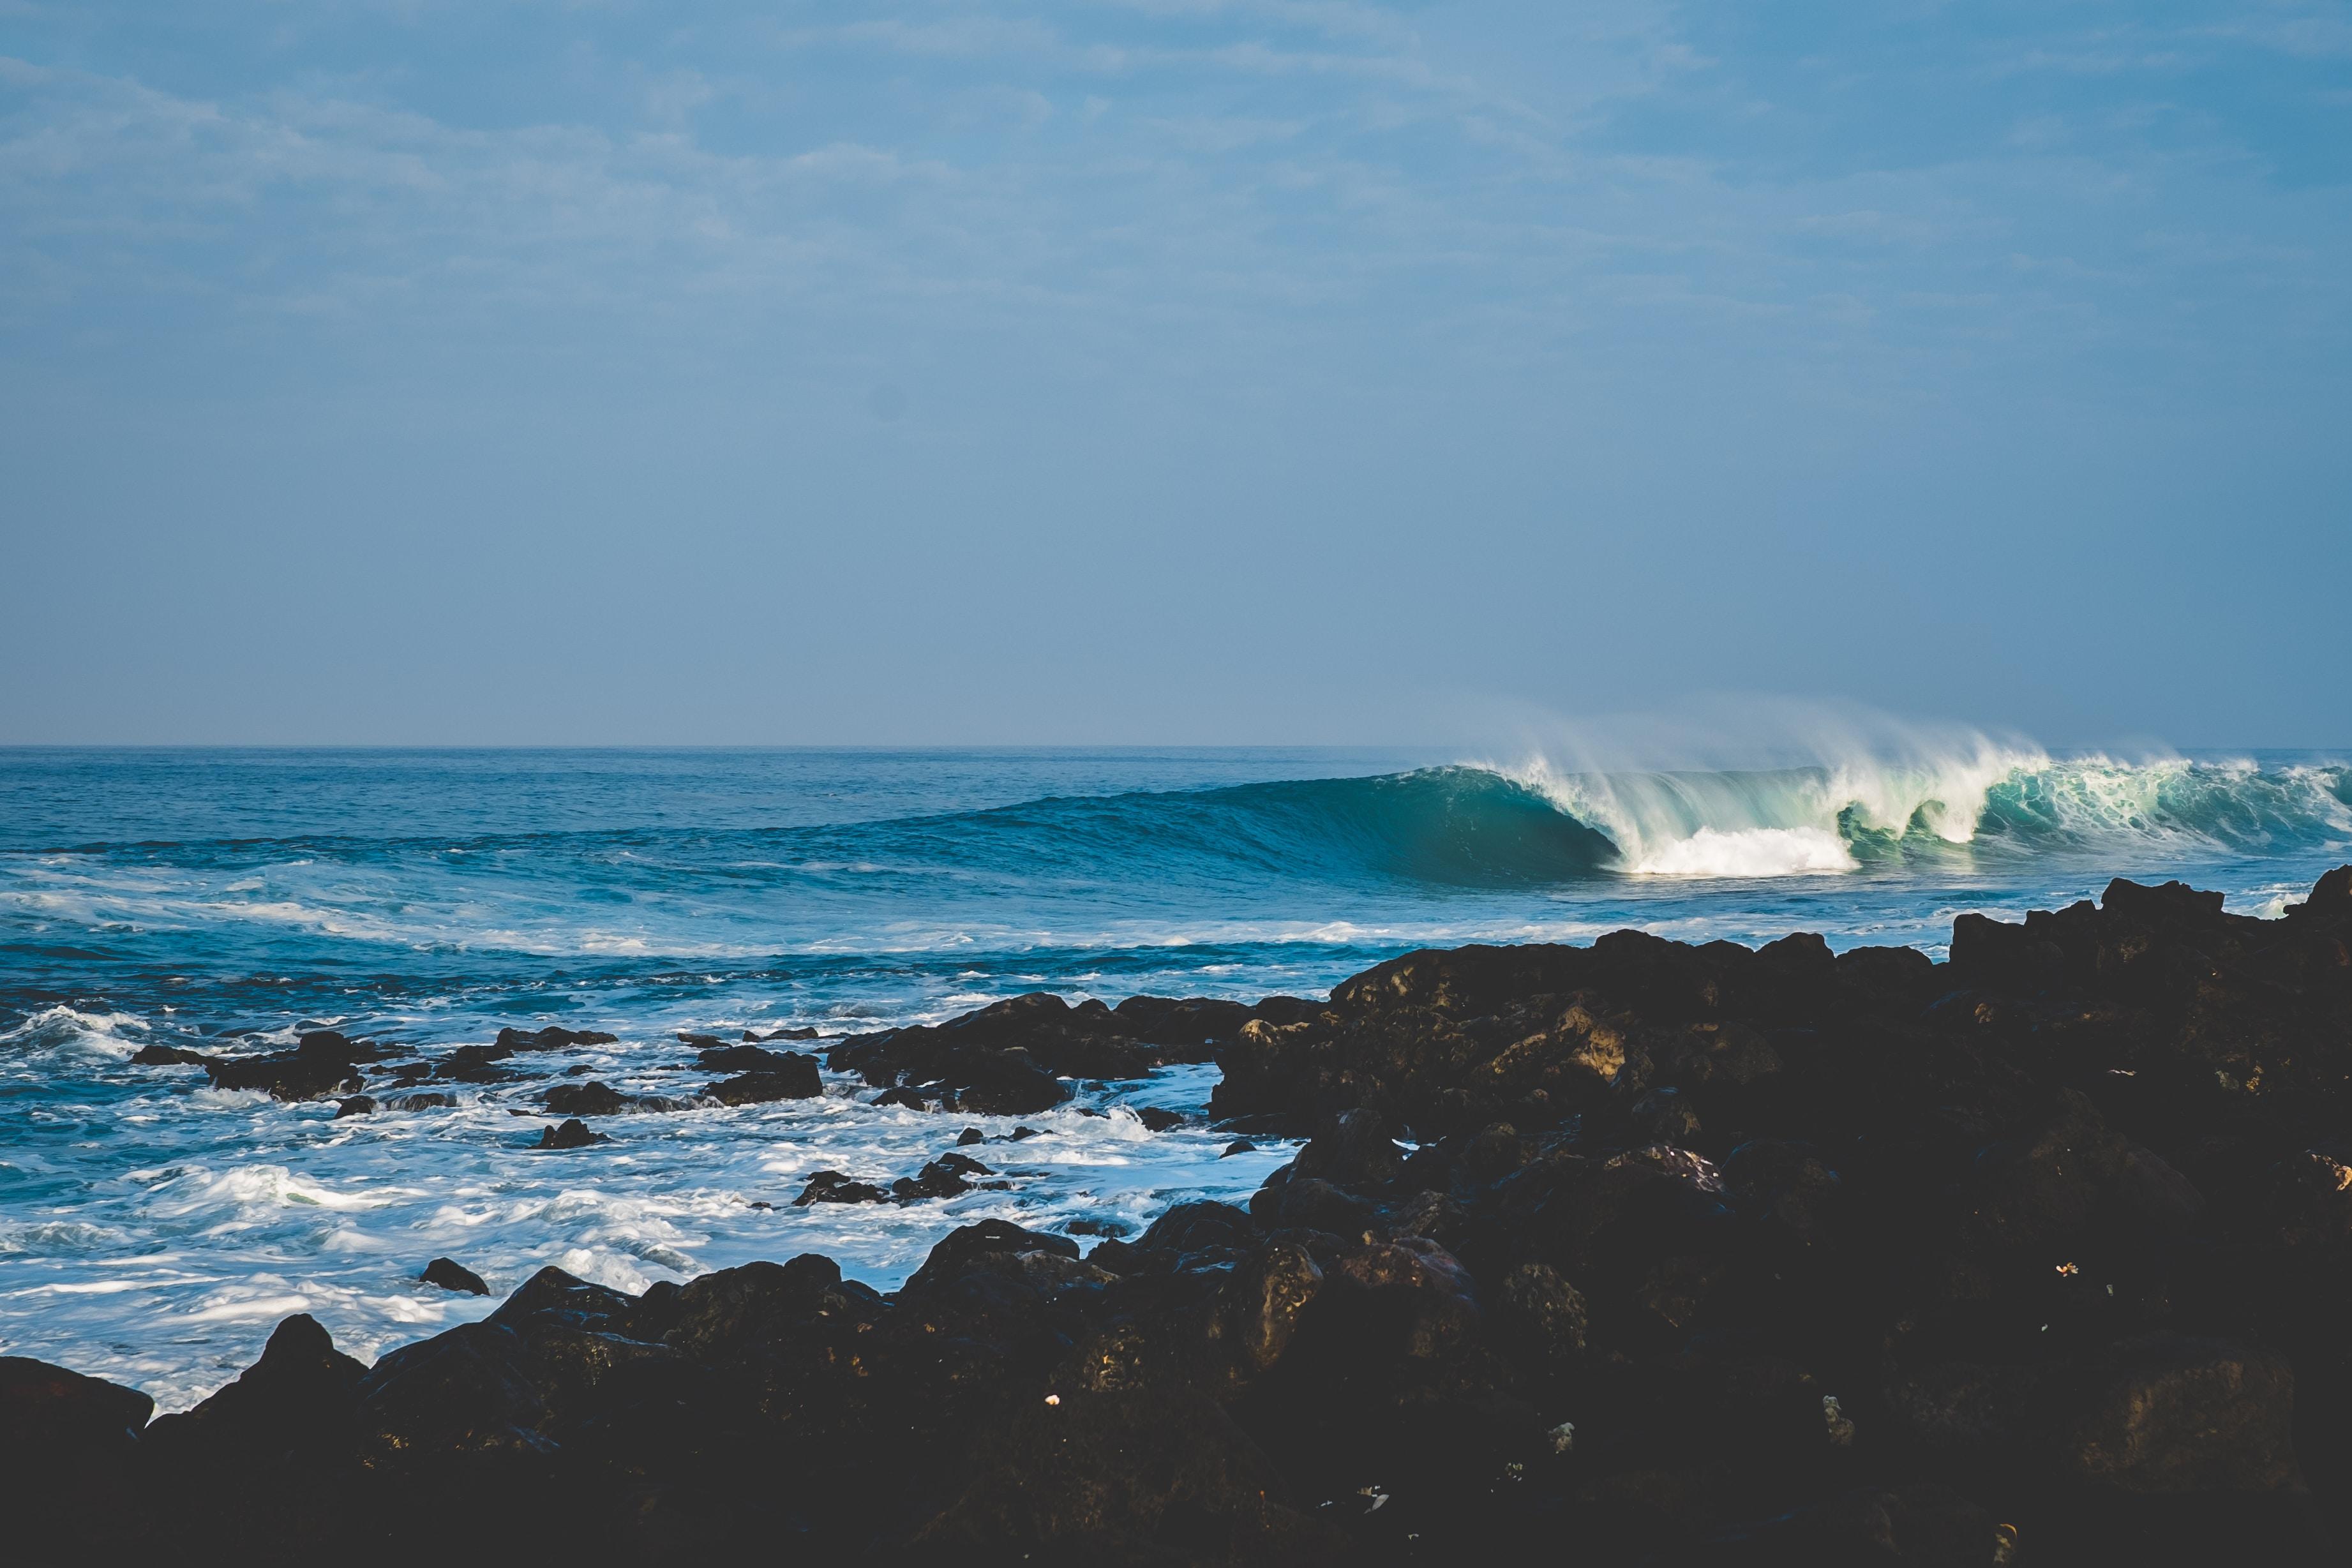 crashing waves through shores